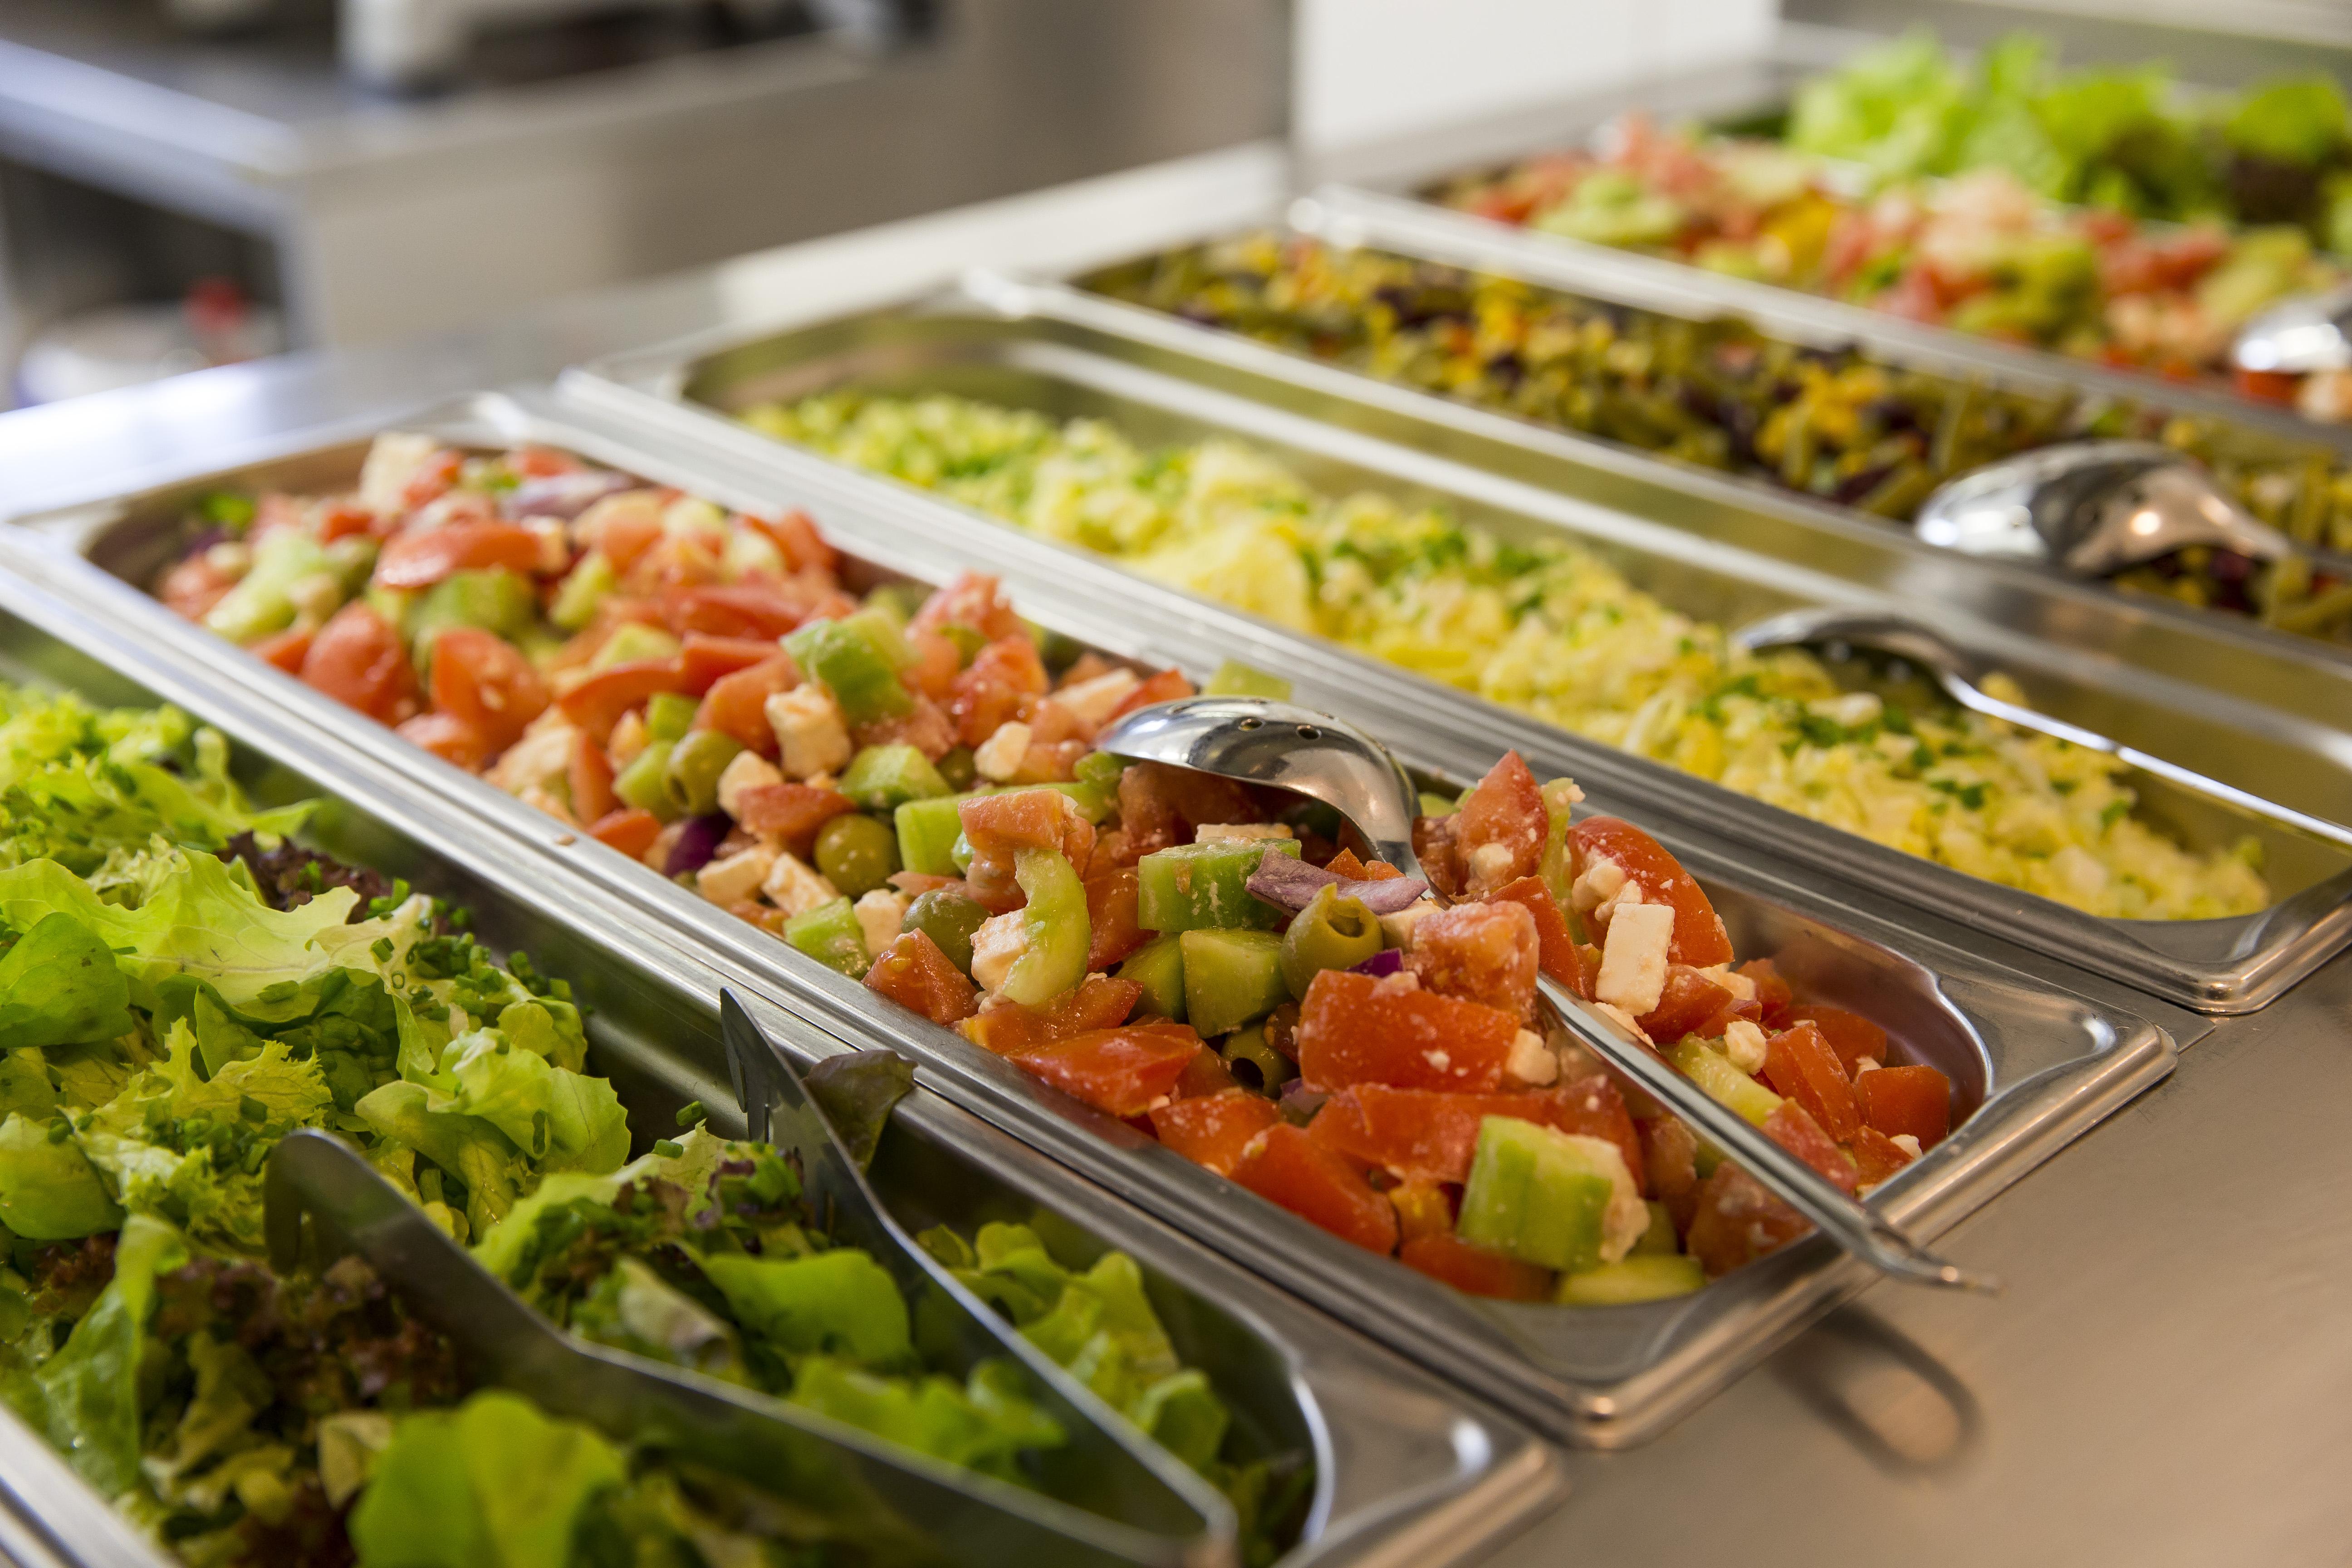 Cafeteria salad buffet